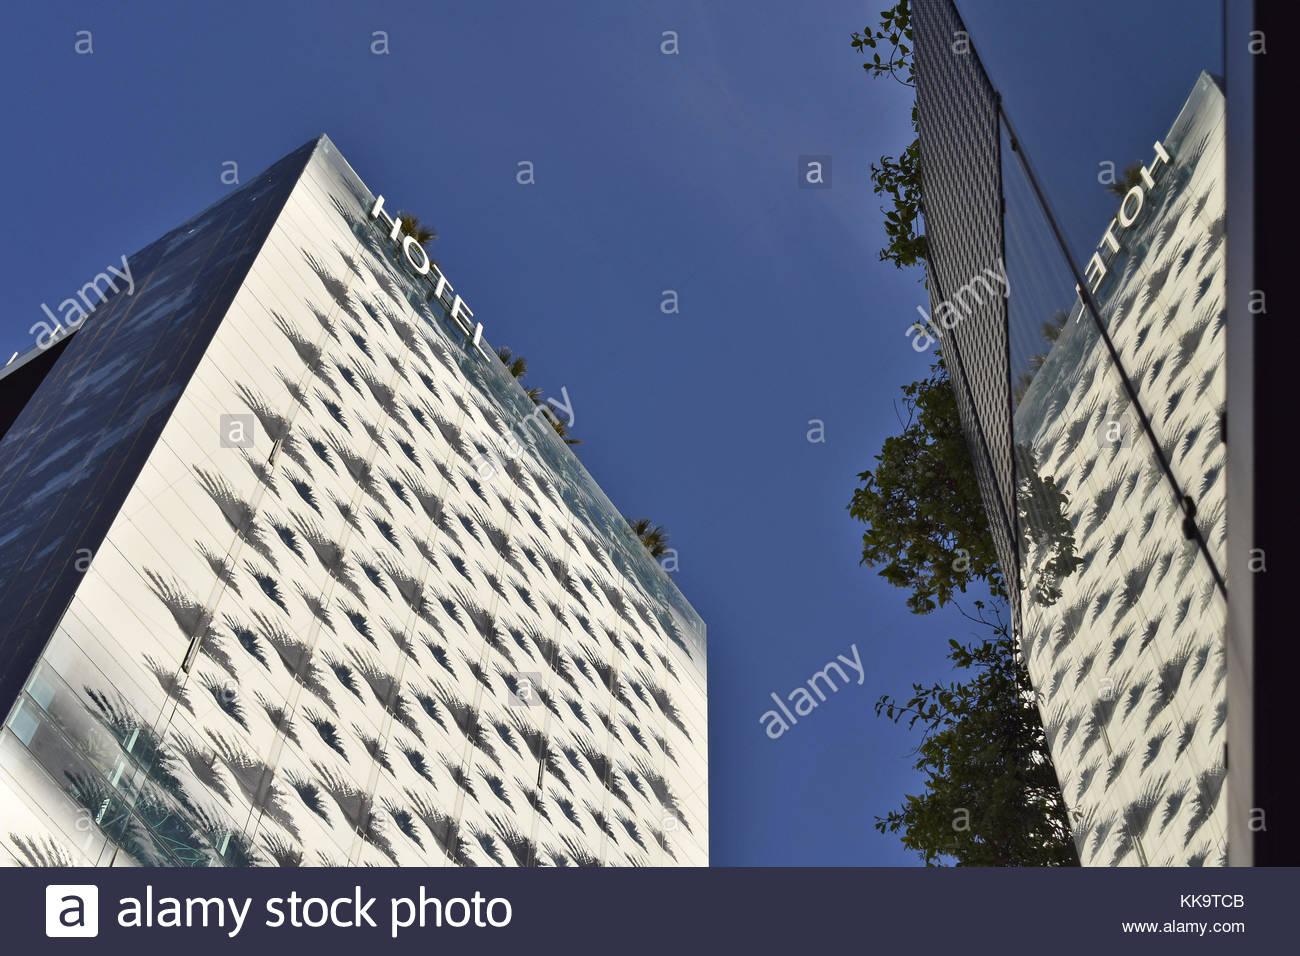 Hotel Renaissance Porta Fira modern hi rise structure in L'Hospitalet de Llobregat Barcelona Spain. - Stock Image